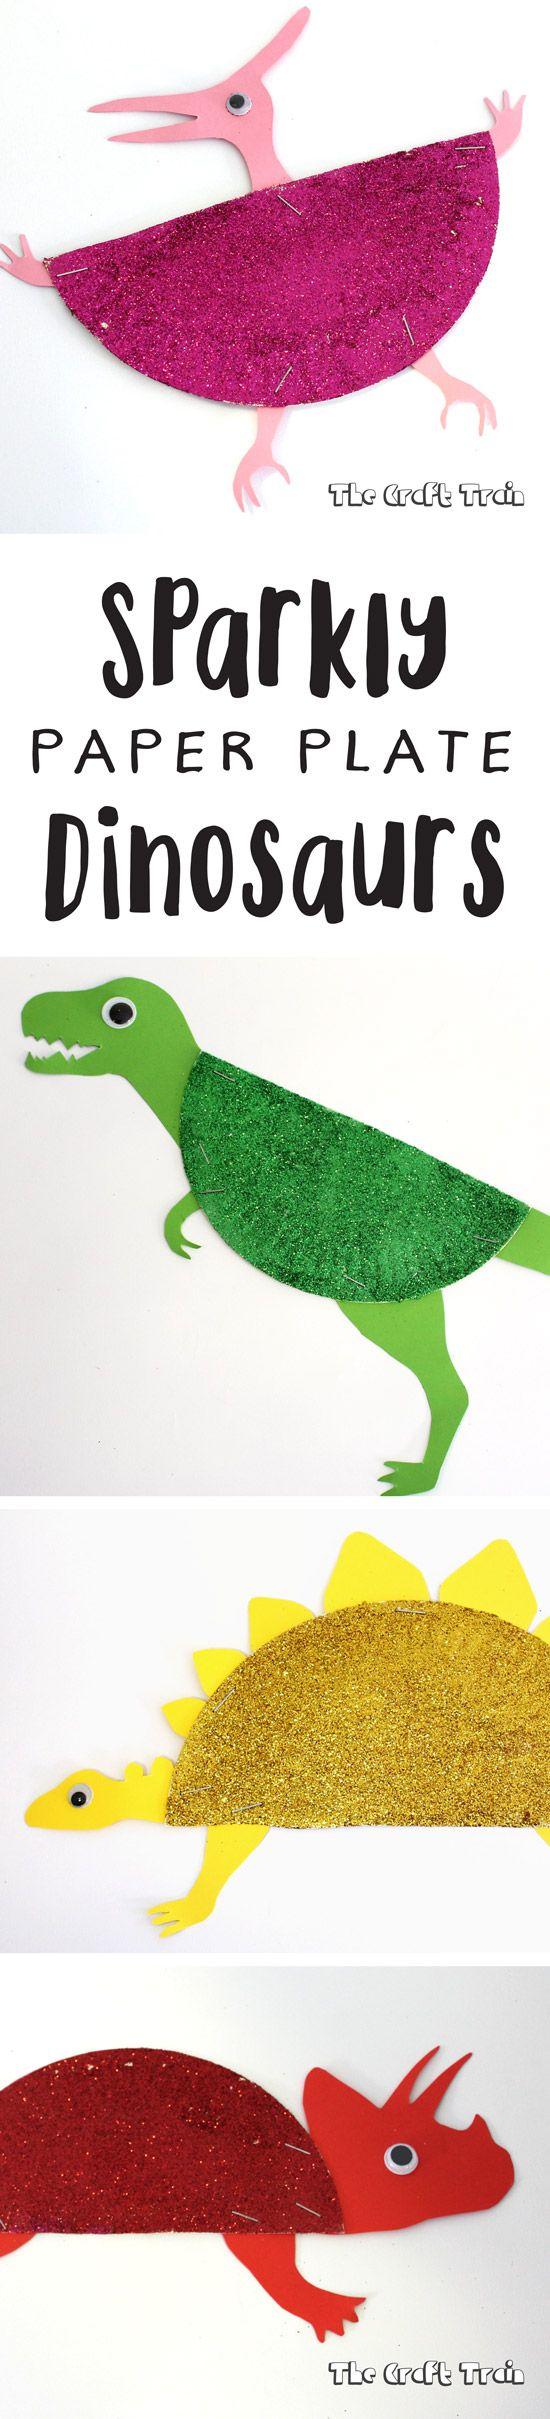 Sparkly Paper Plate Dinosaurs | Pre-school crafts | Pinterest ...